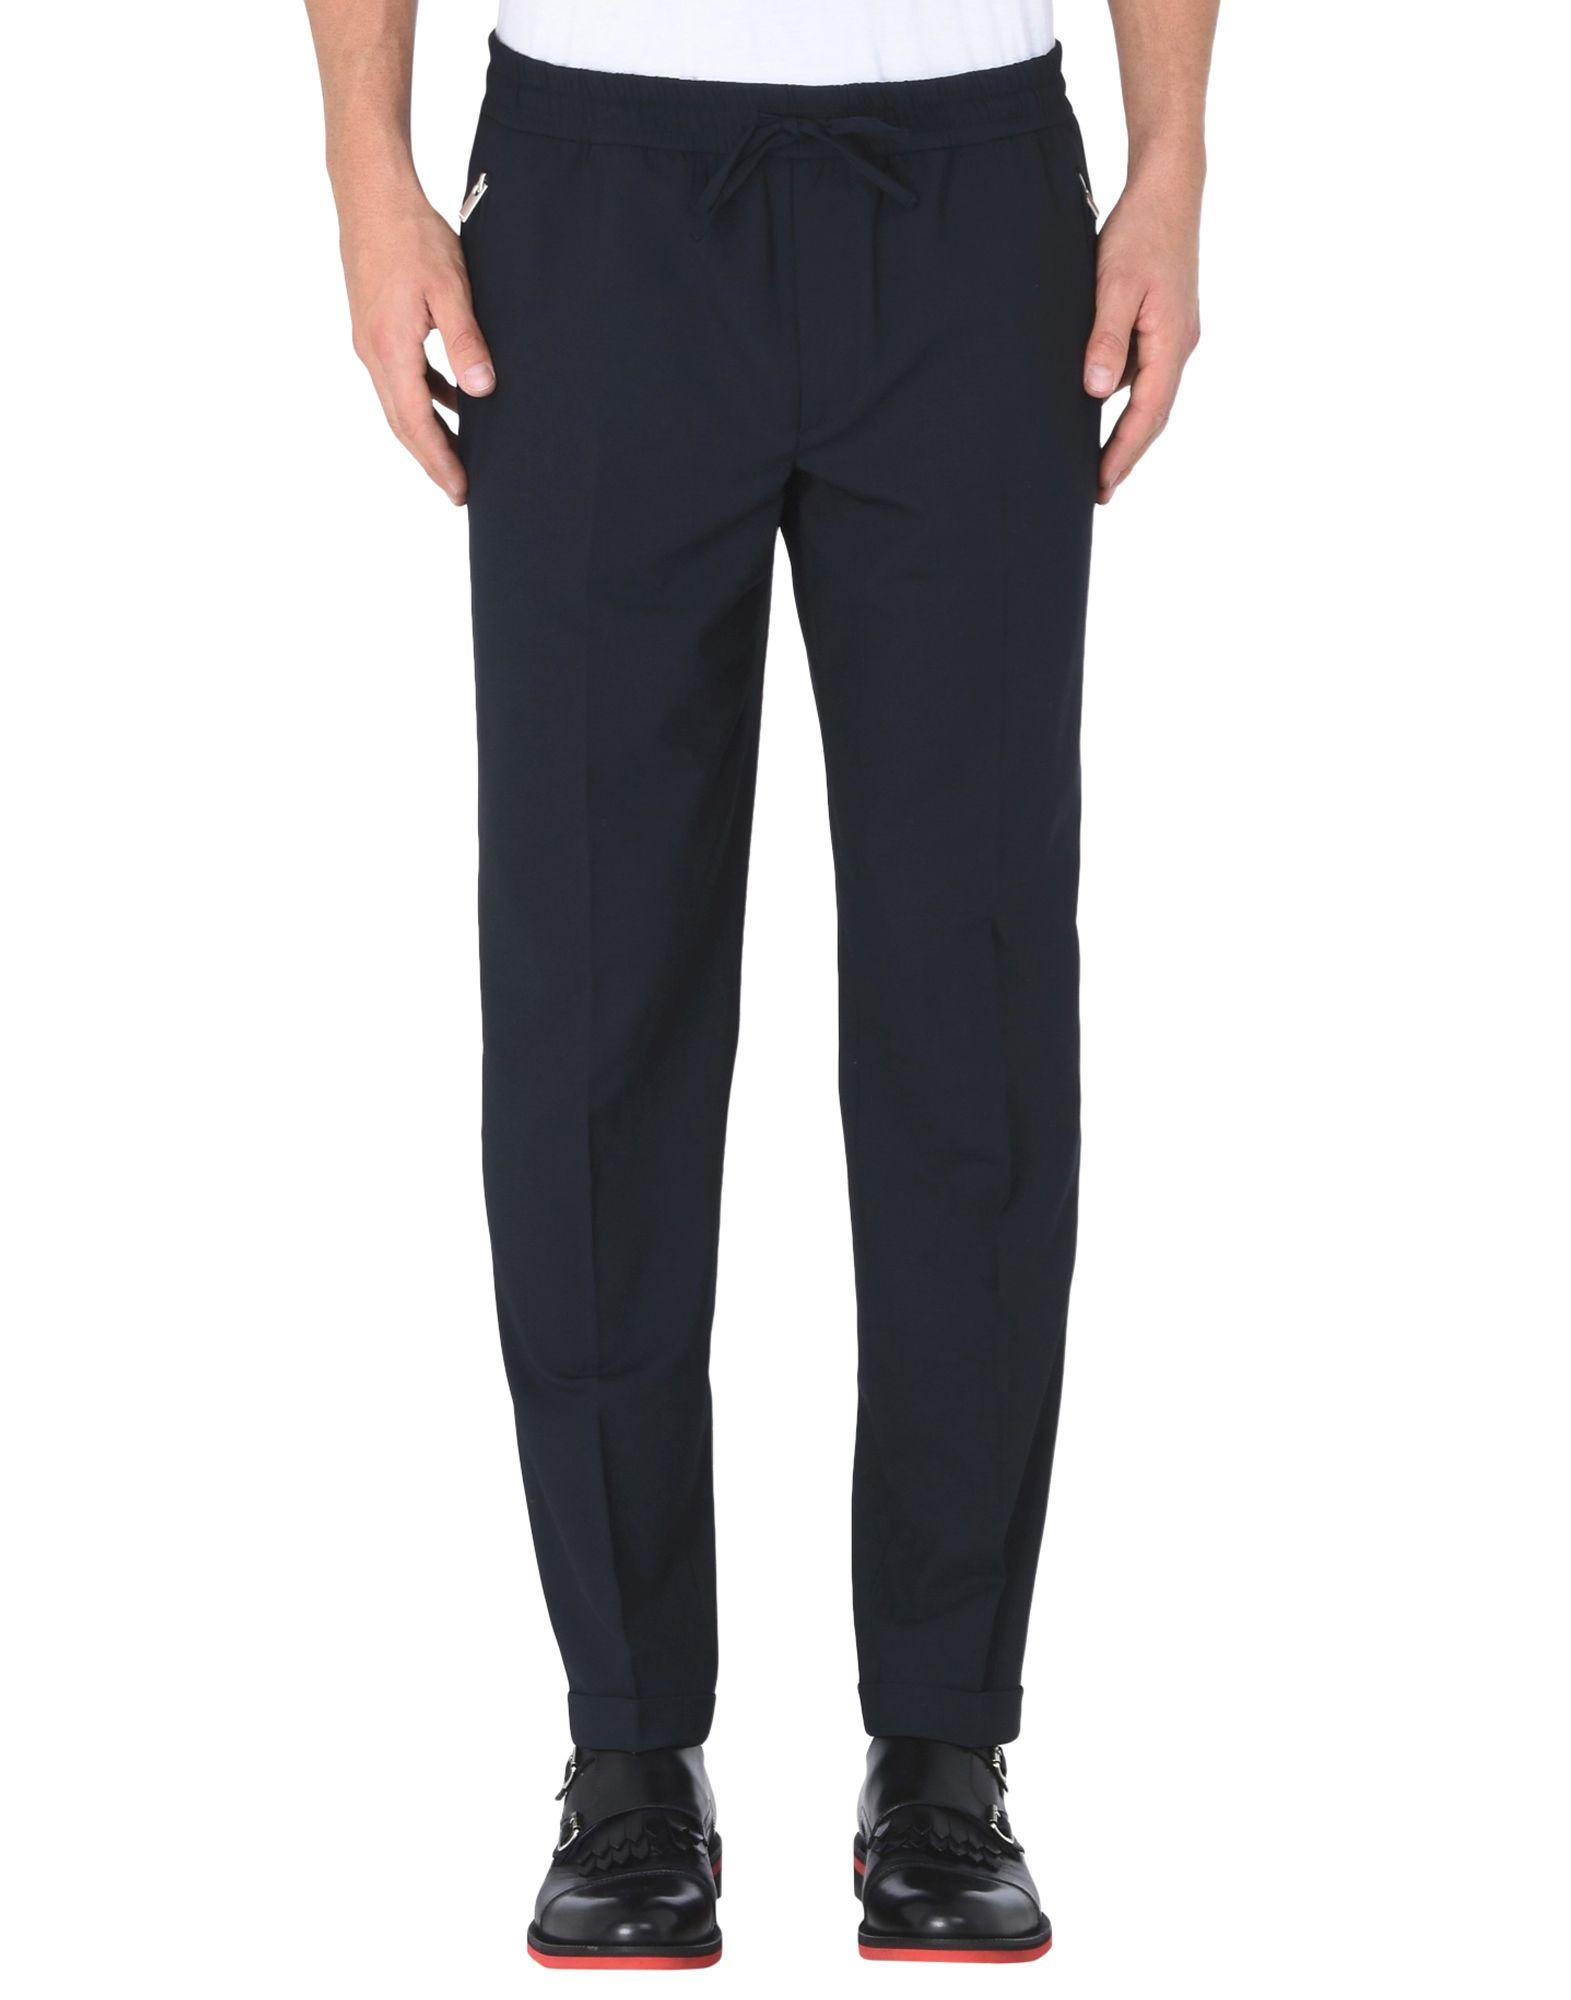 Pantalone The Kooples Uomo - Acquista online su